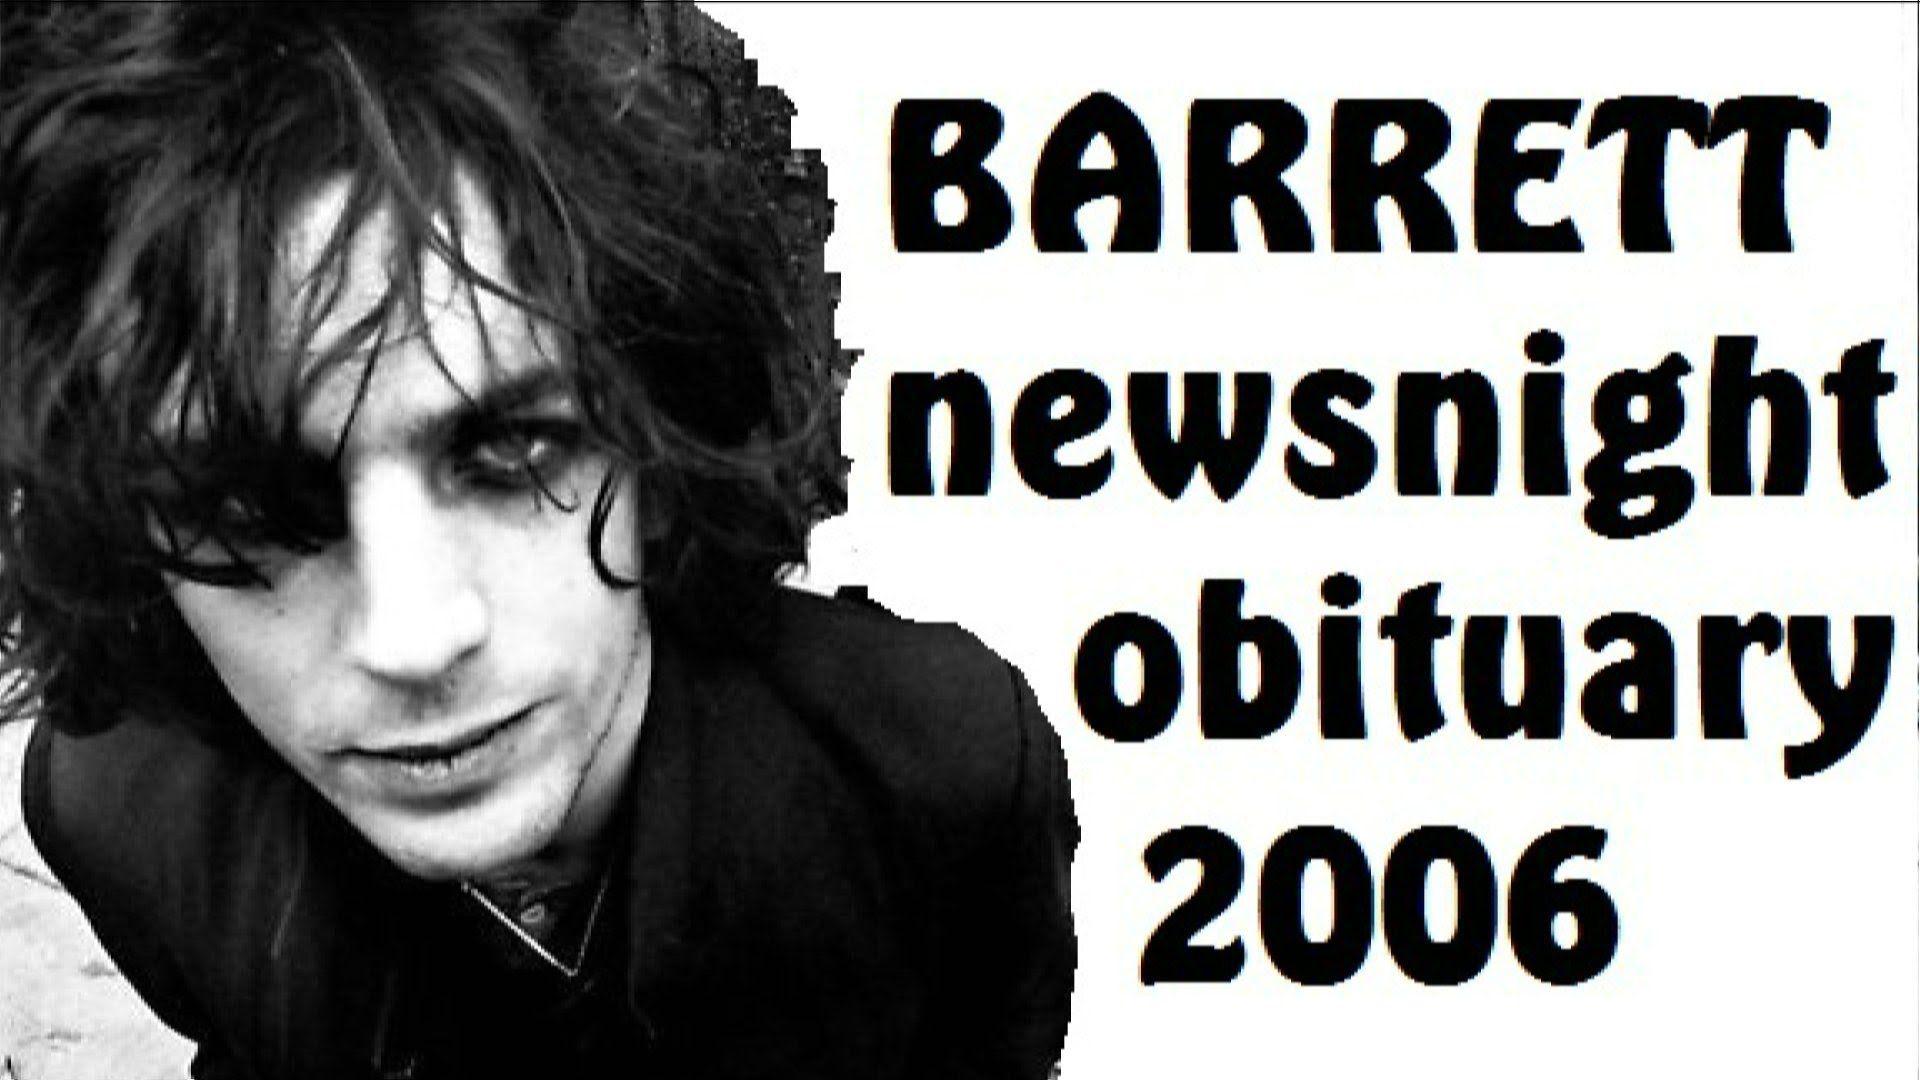 Syd Barrett Pink Floyd Bbc Newsnight Obituary 2006